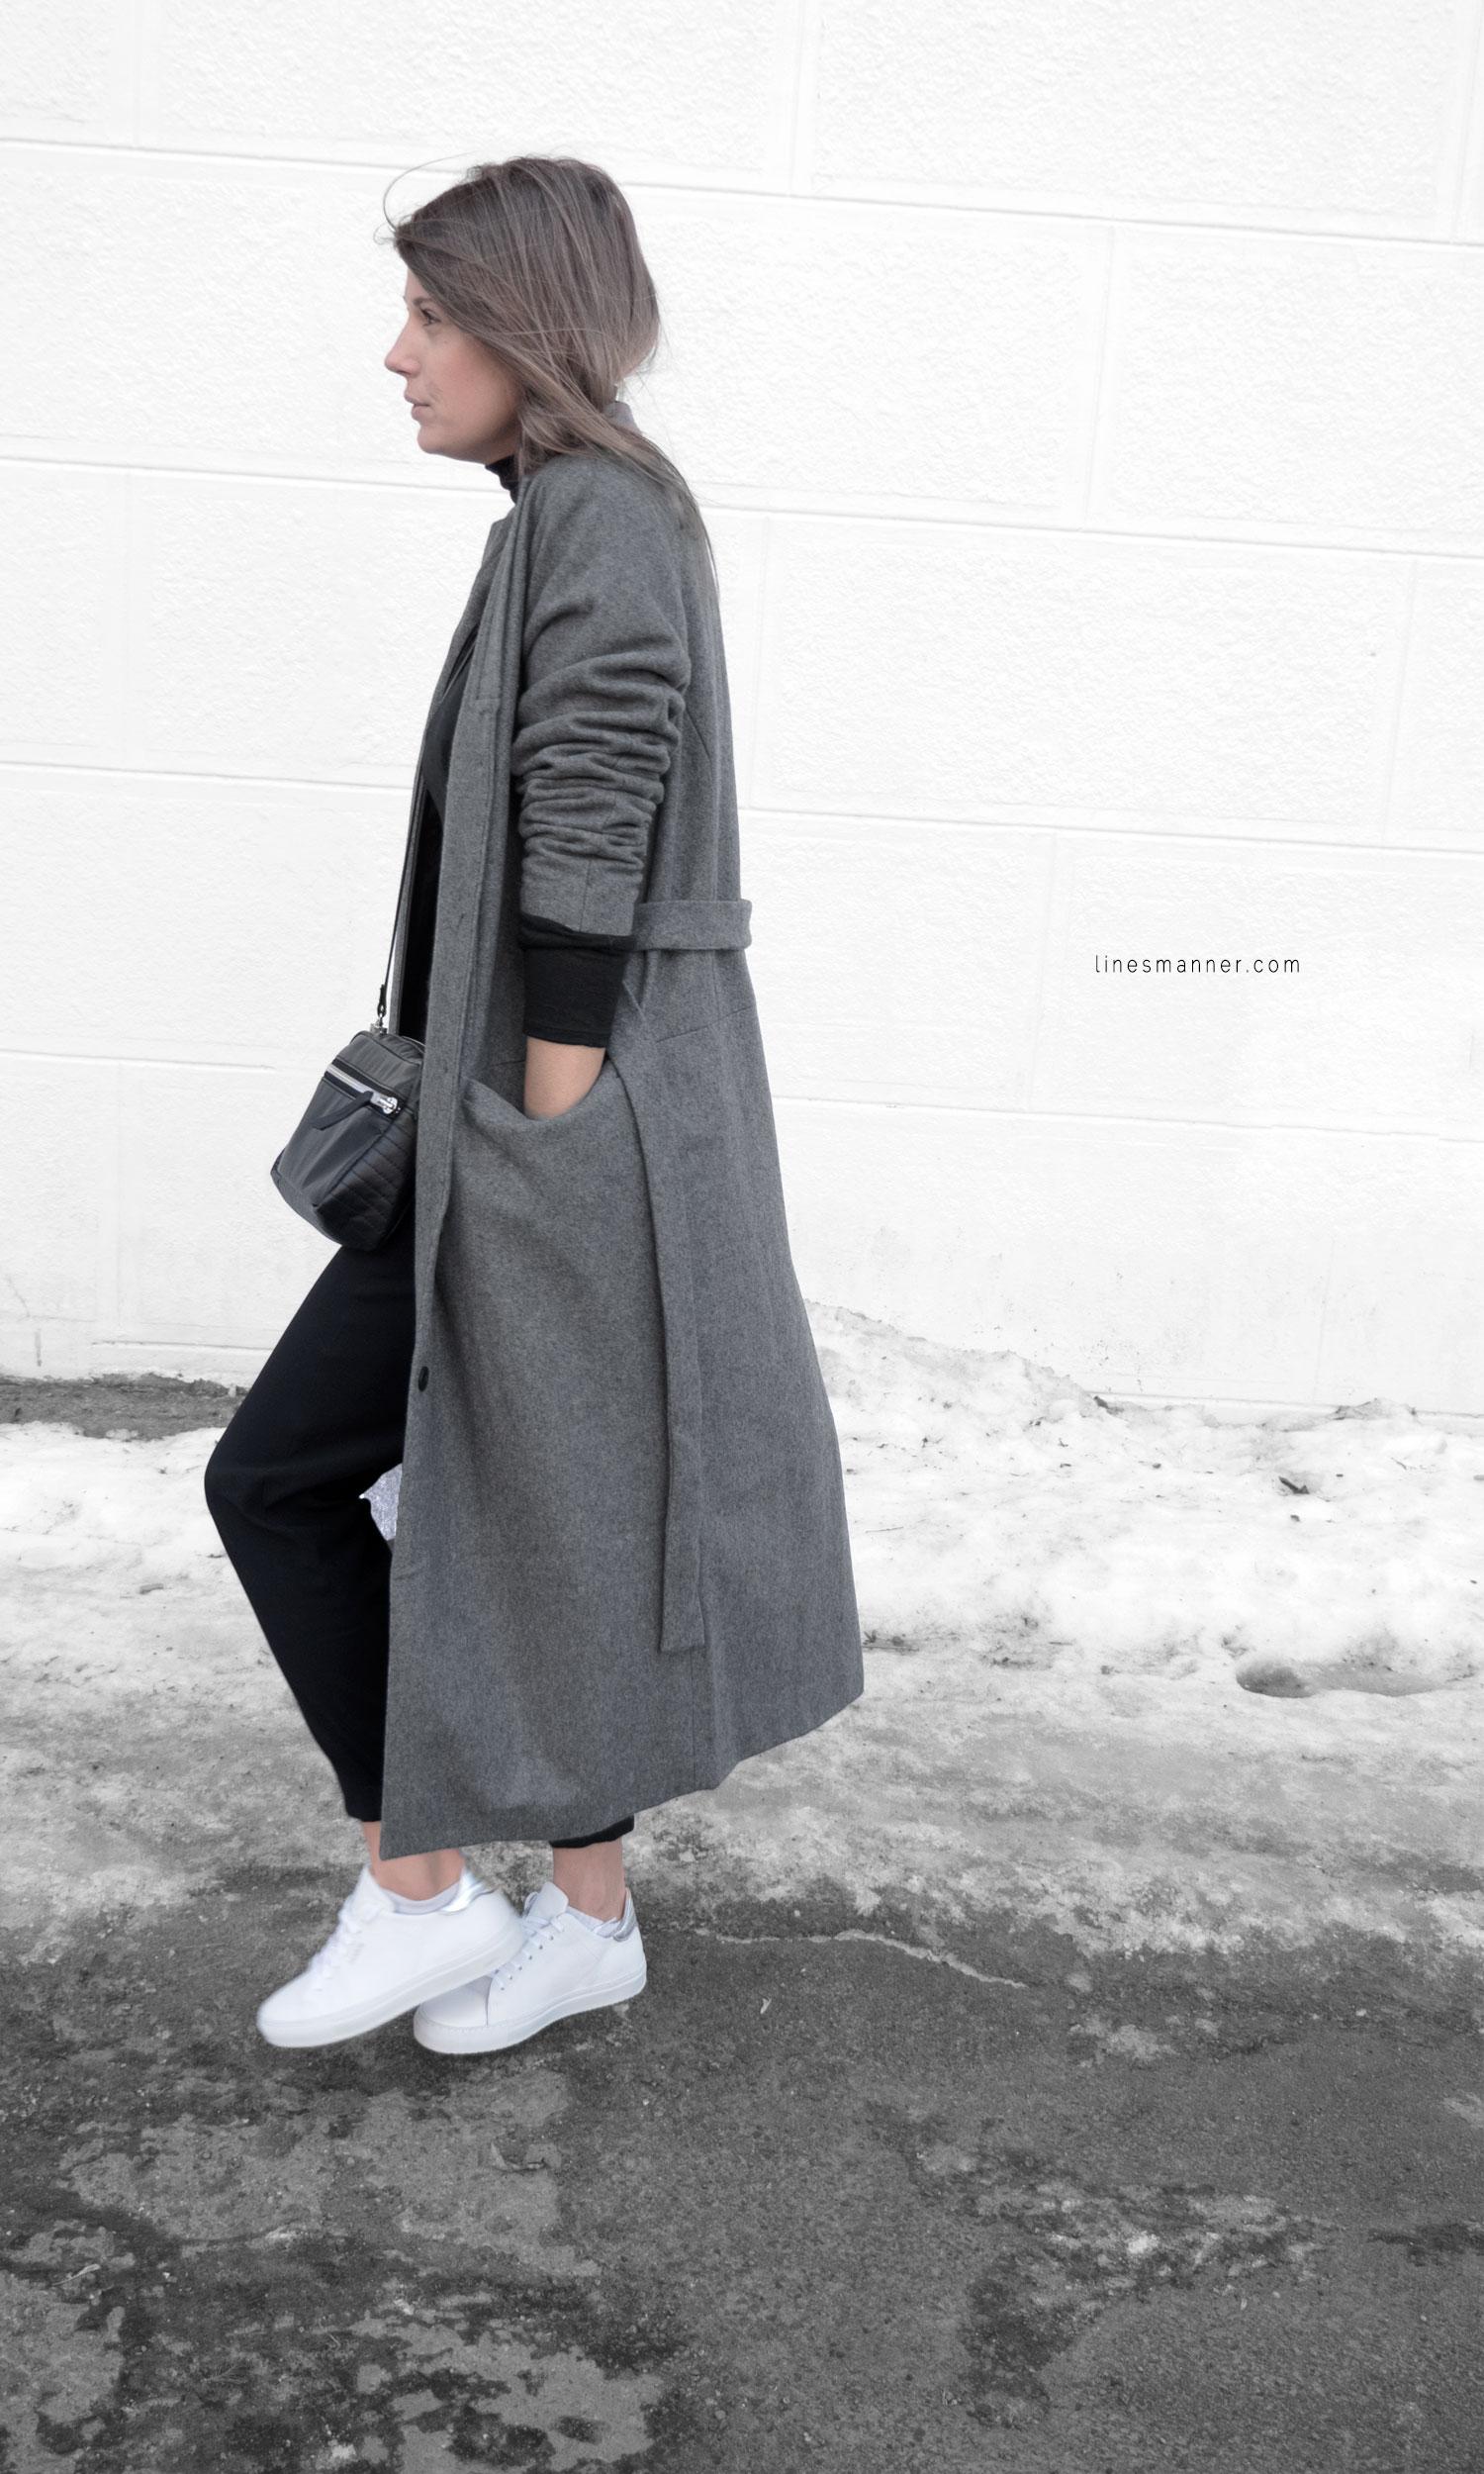 Lines-Manner-Simplicity-Neutral-Palette-Functional-Versatile-Timeless-Grey-Winter_Coat-Details-Essentials-Minimal-Basics-7